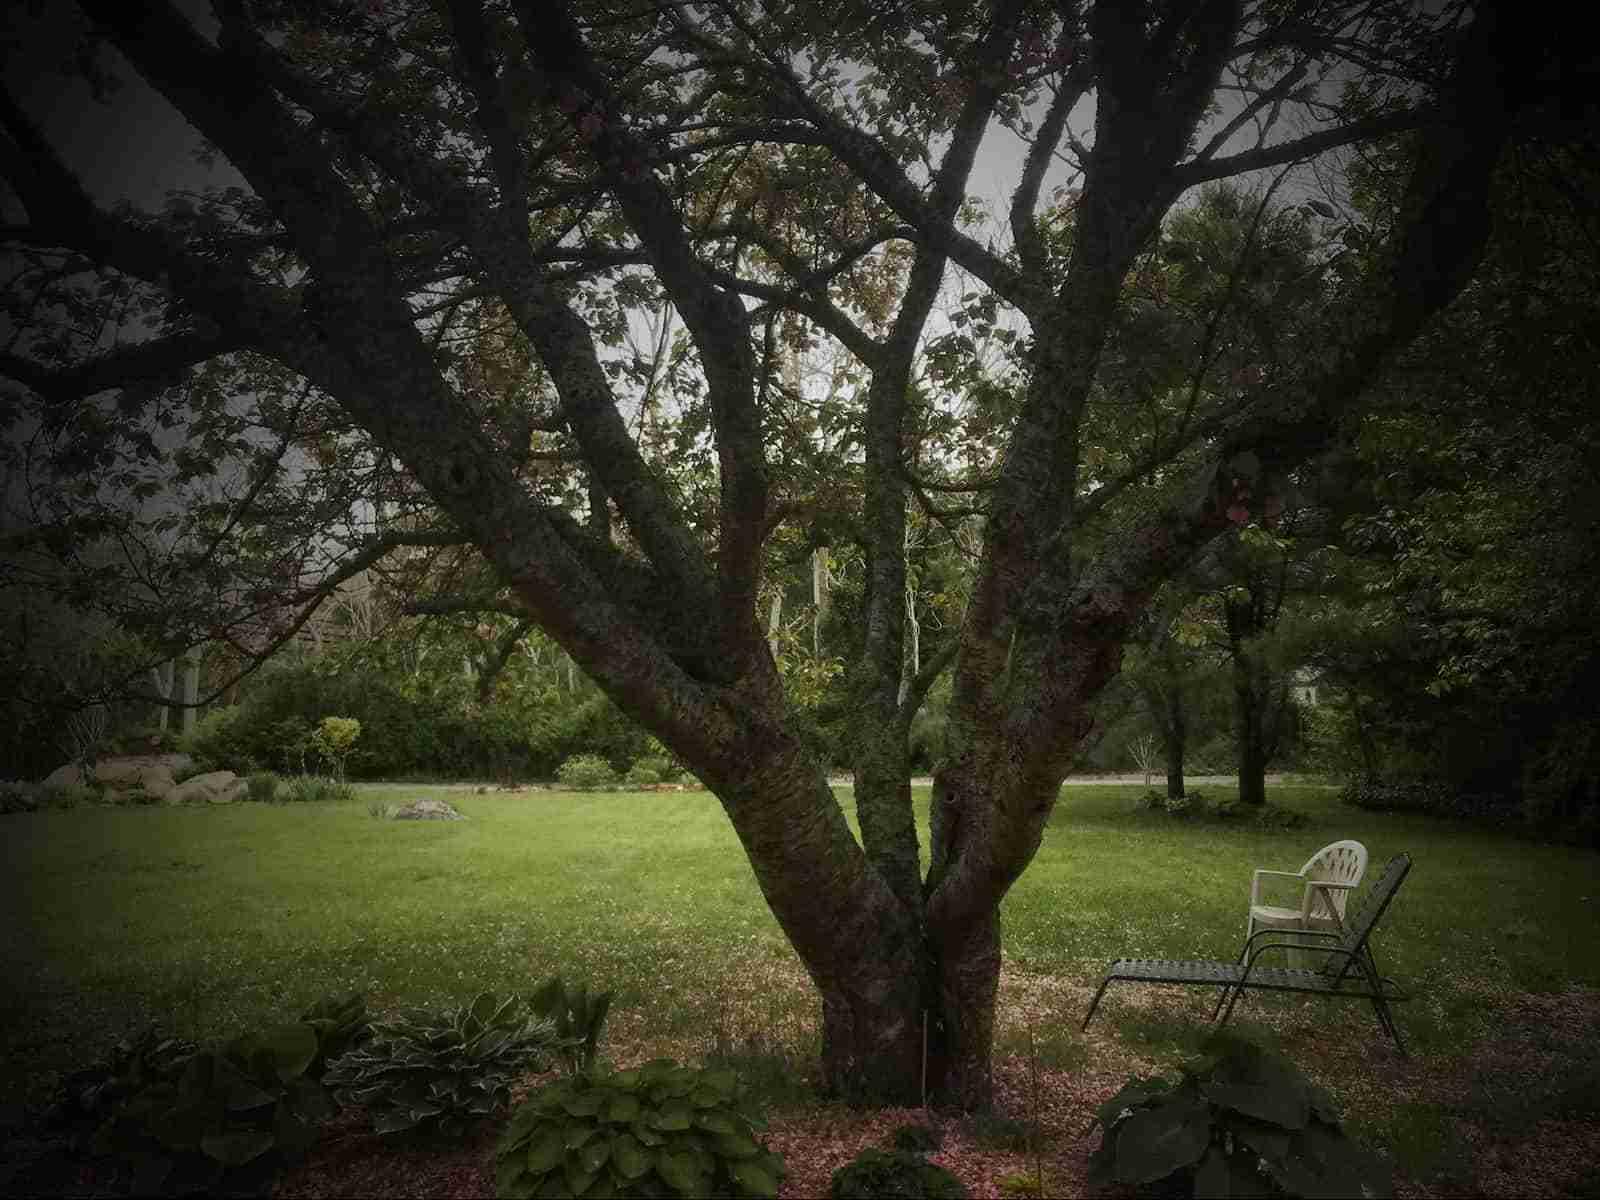 Cape Cod Garden Walk - Garden Memories Spring 2020